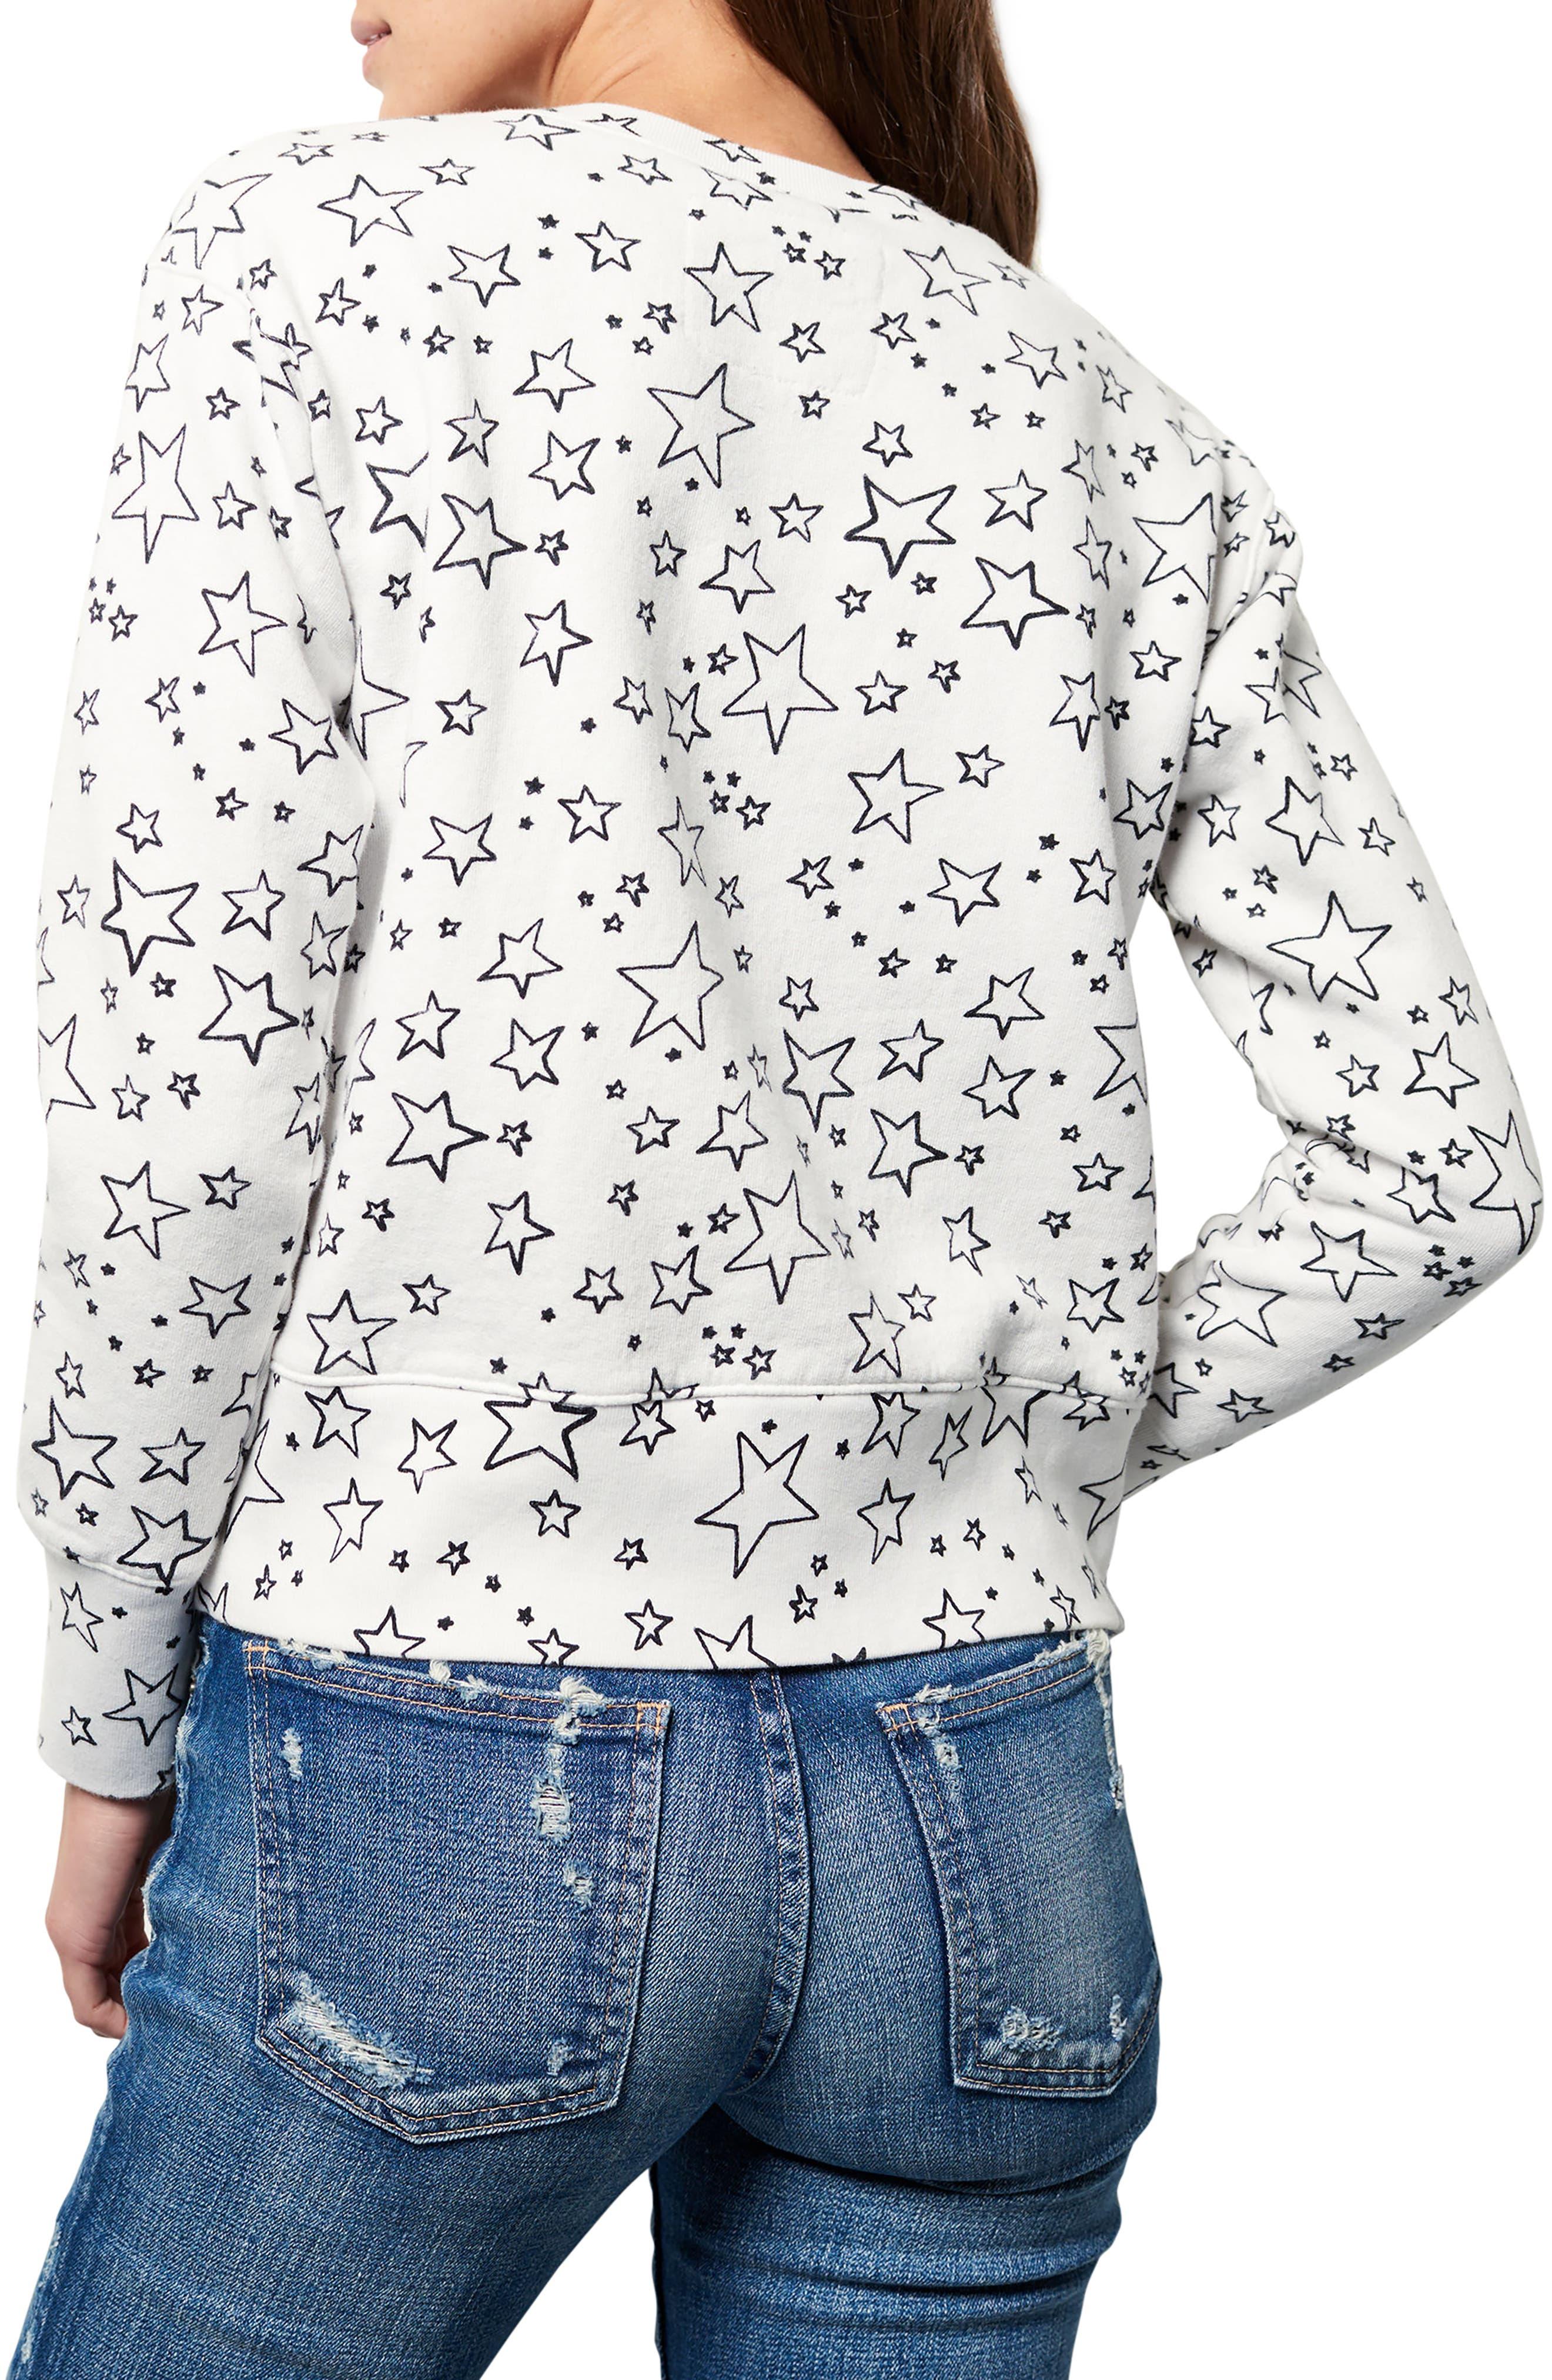 Frank & Eileen Star Sweatshirt,                             Alternate thumbnail 2, color,                             Lucky Star Day